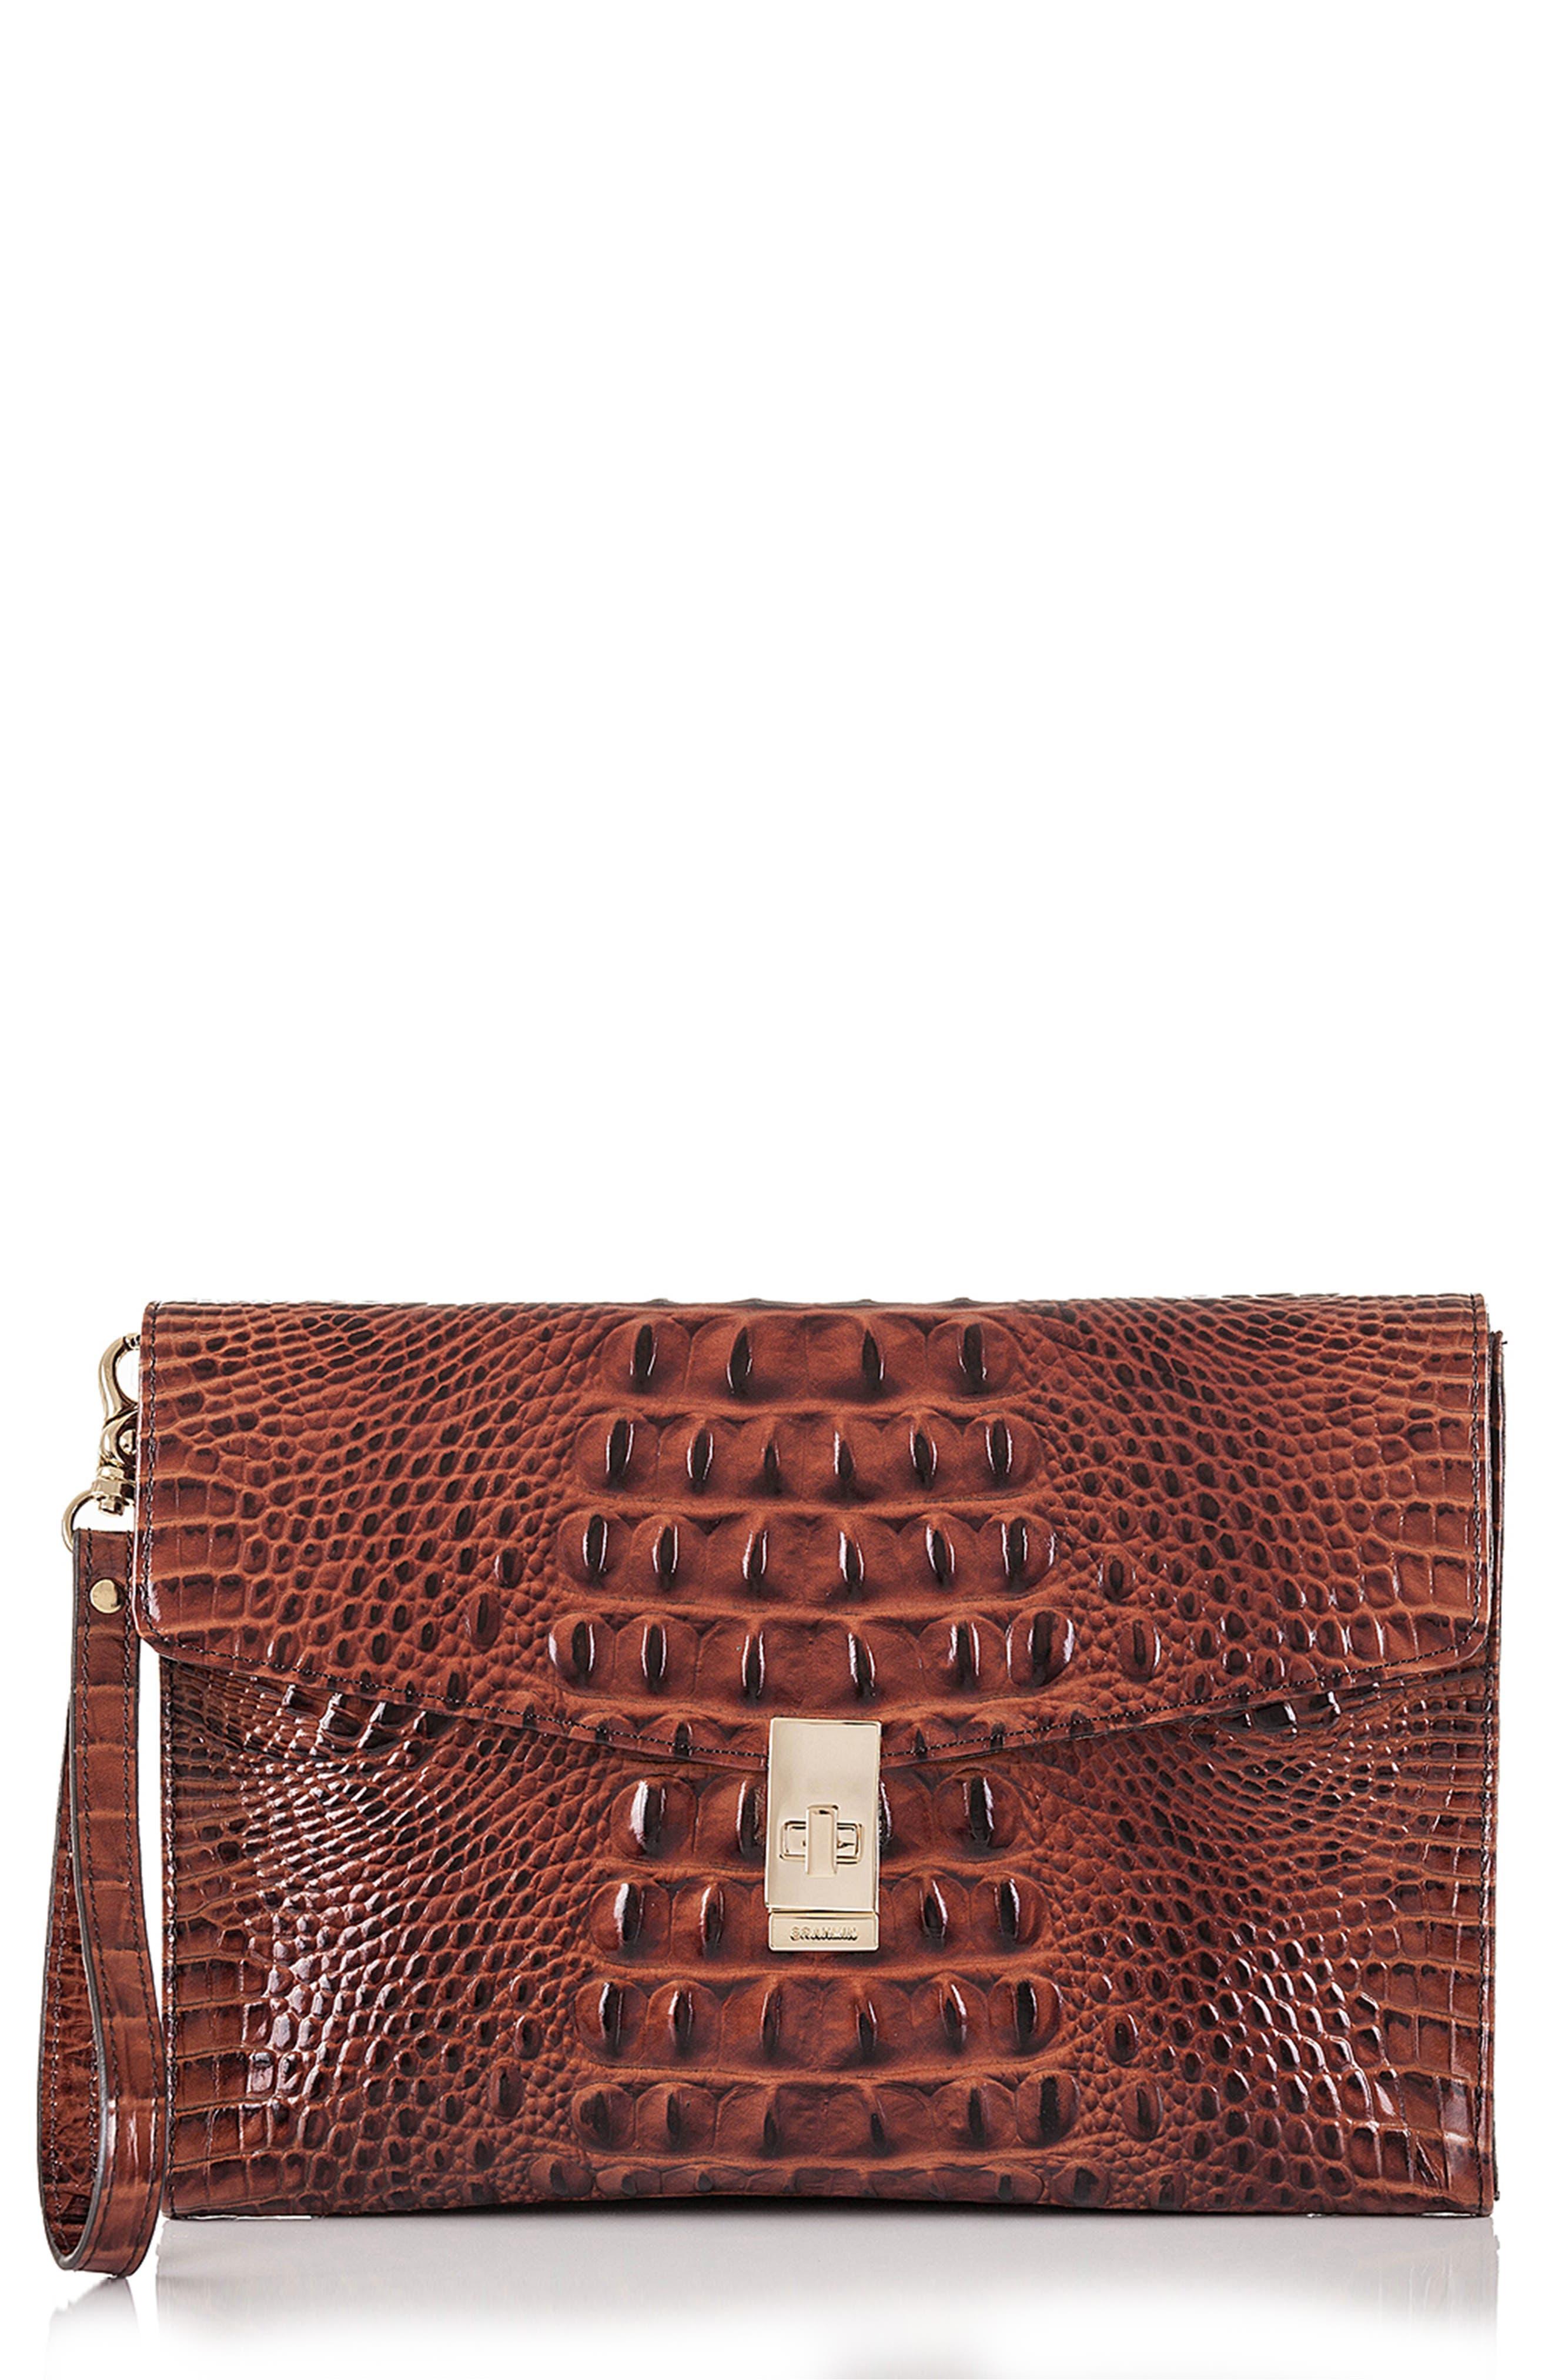 BRAHMIN, Ruth Croc Embossed Leather Clutch, Main thumbnail 1, color, PECAN MELBOURNE